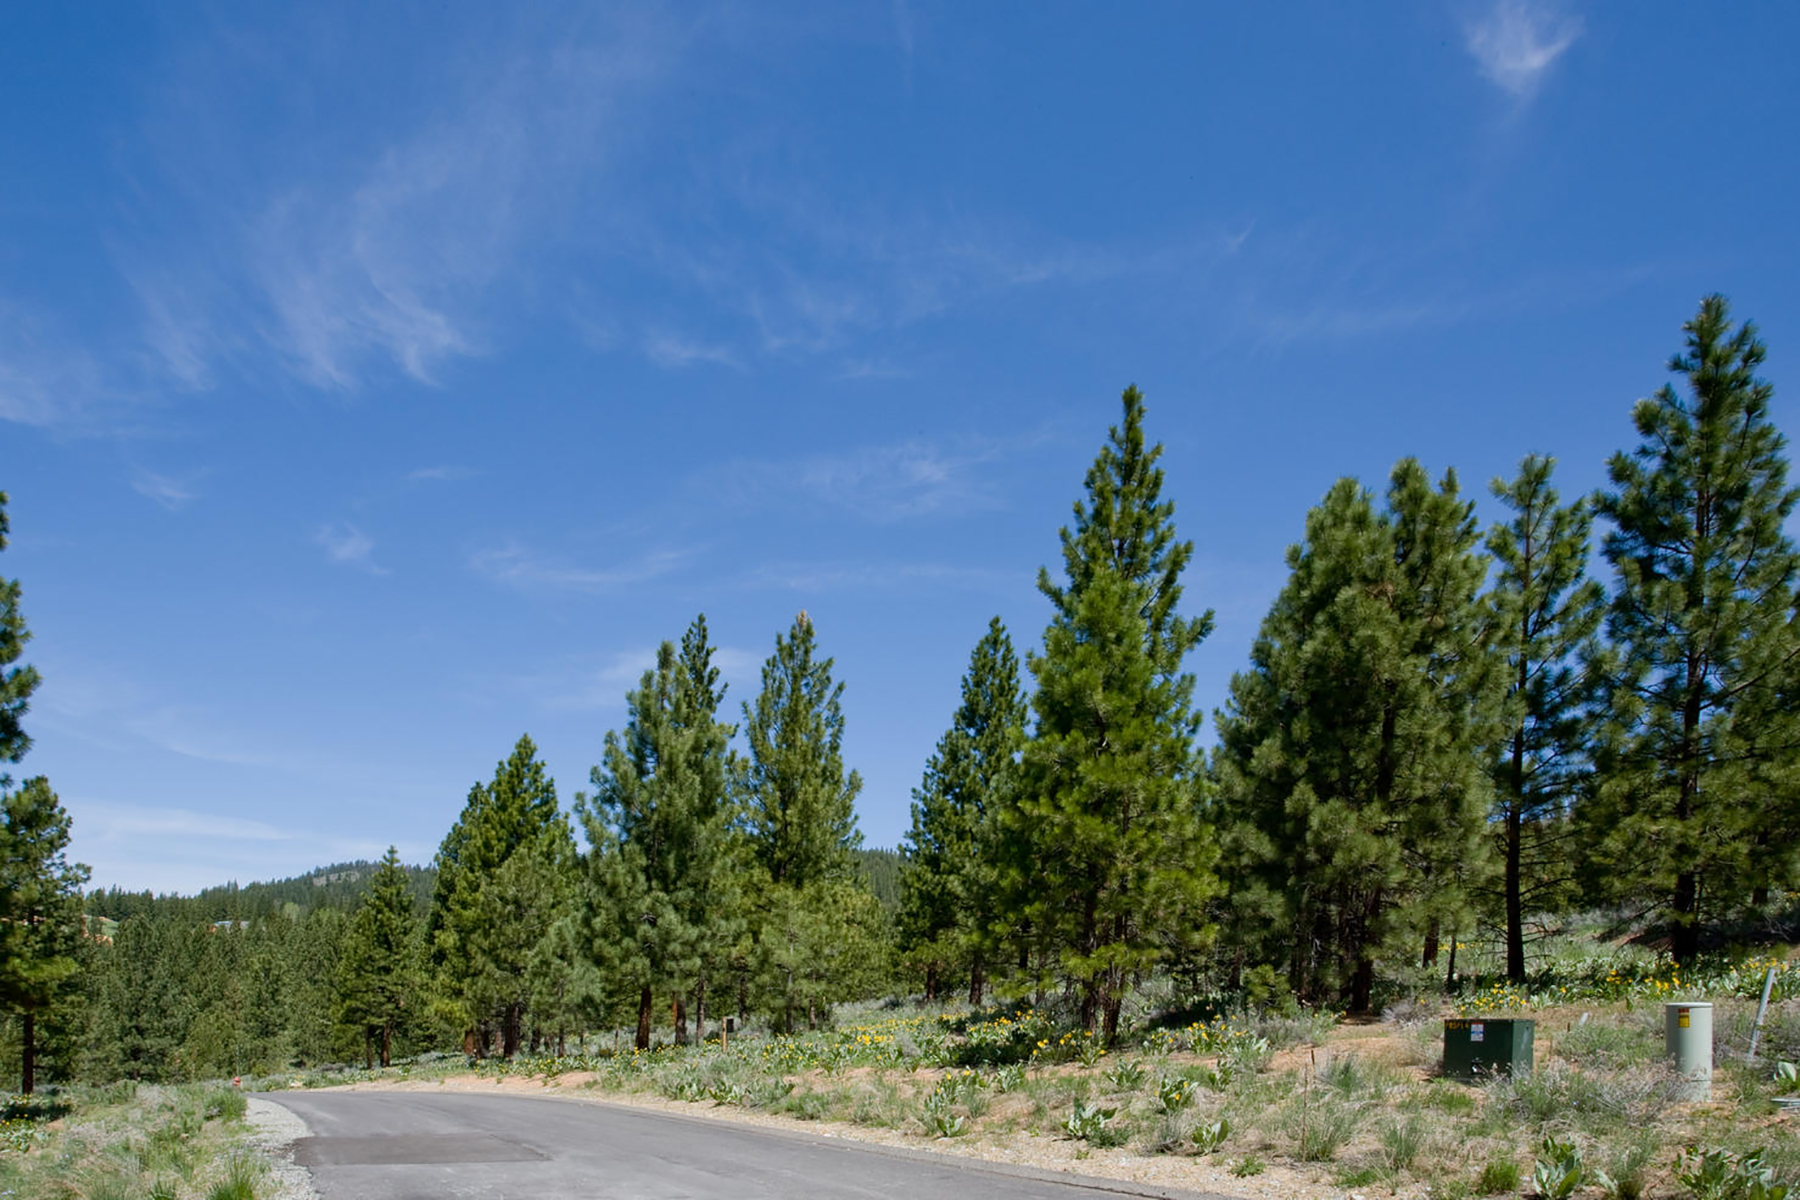 Additional photo for property listing at 306 Arrowleaf, Portola, CA 96122 306 Arrowleaf Road Portola, California 96122 United States